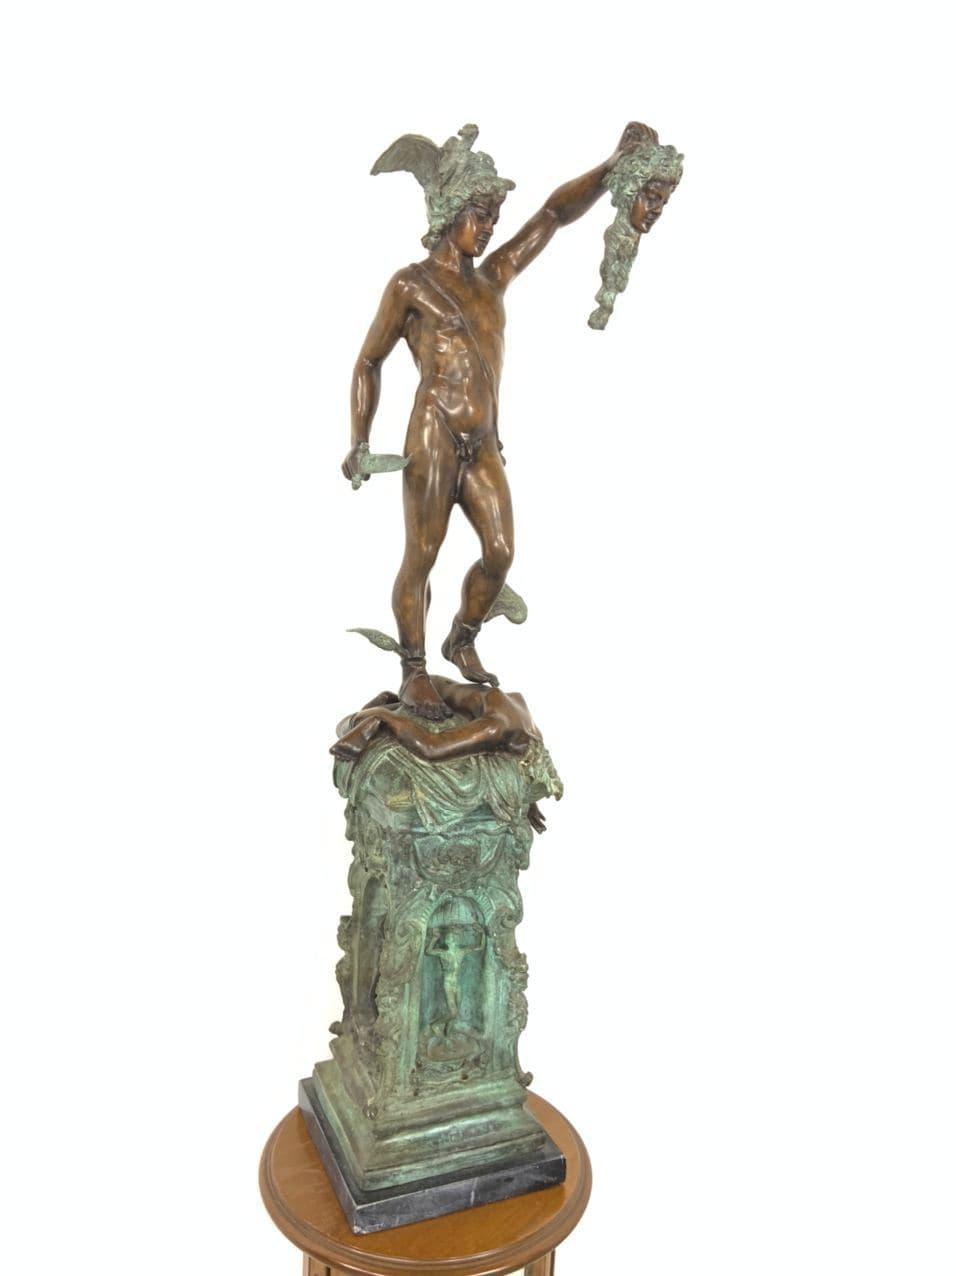 Антикварная бронзовая статуя Персея